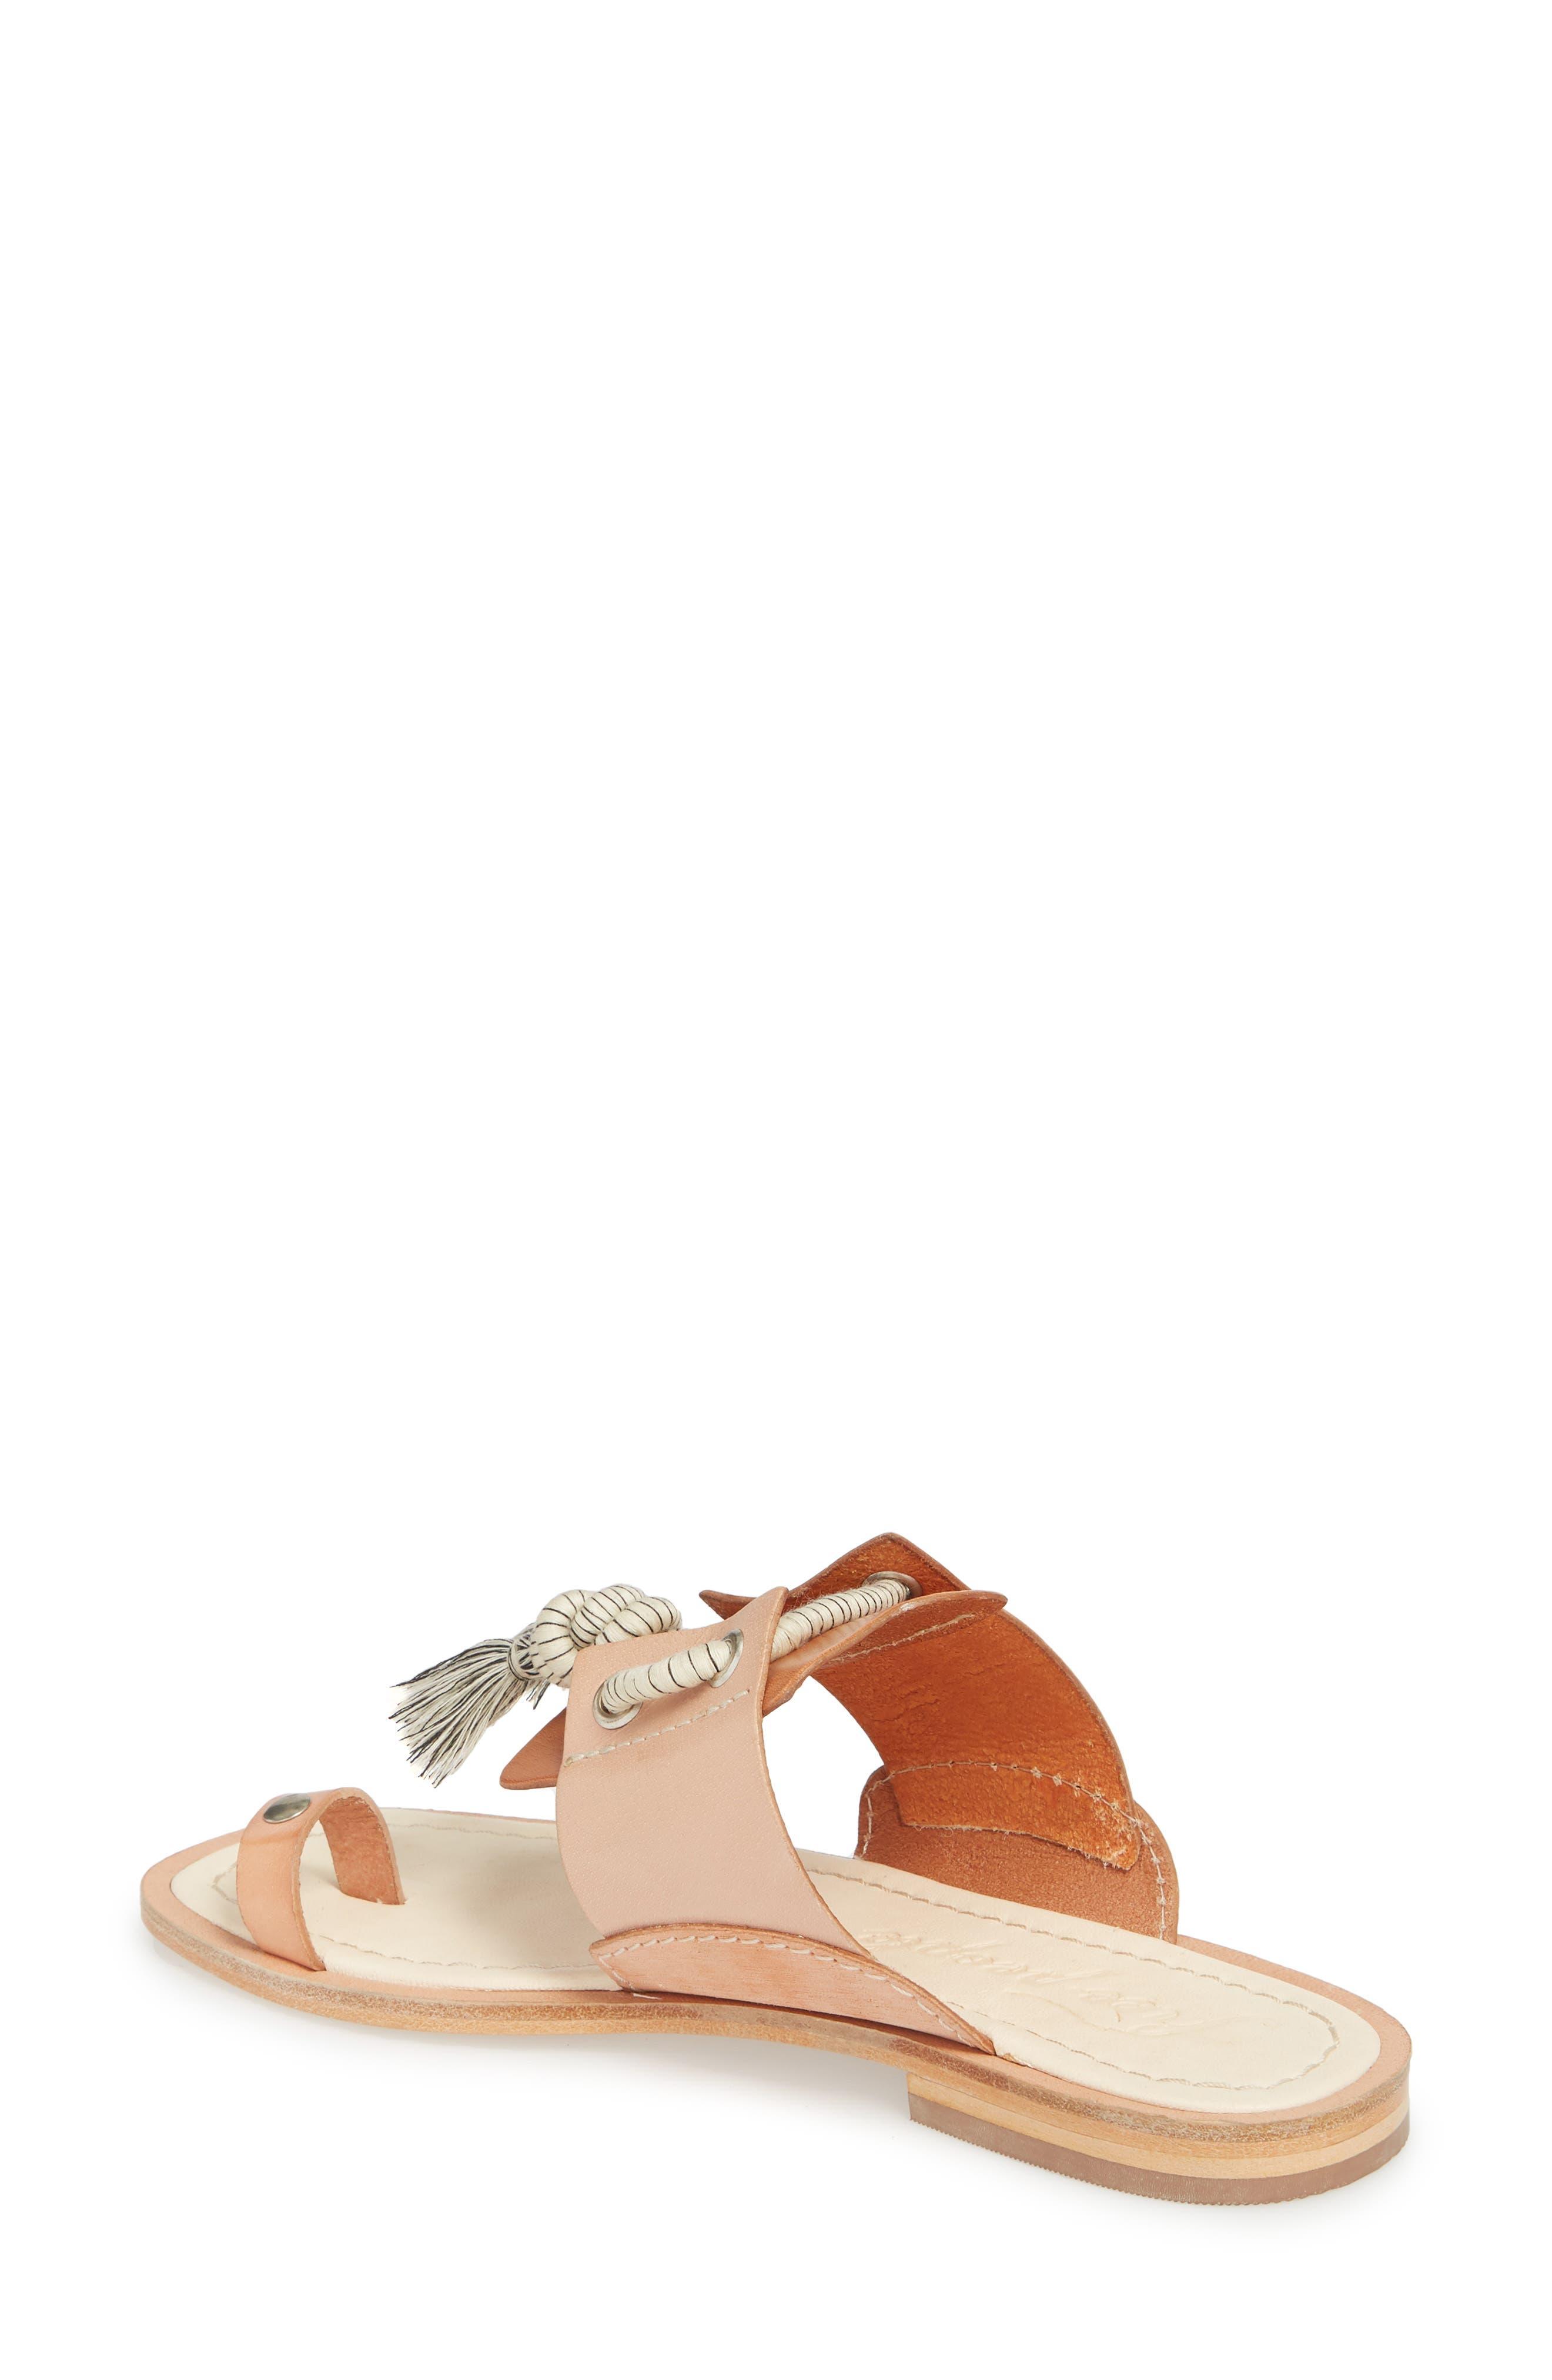 Maui Tasseled Slide Sandal,                             Alternate thumbnail 4, color,